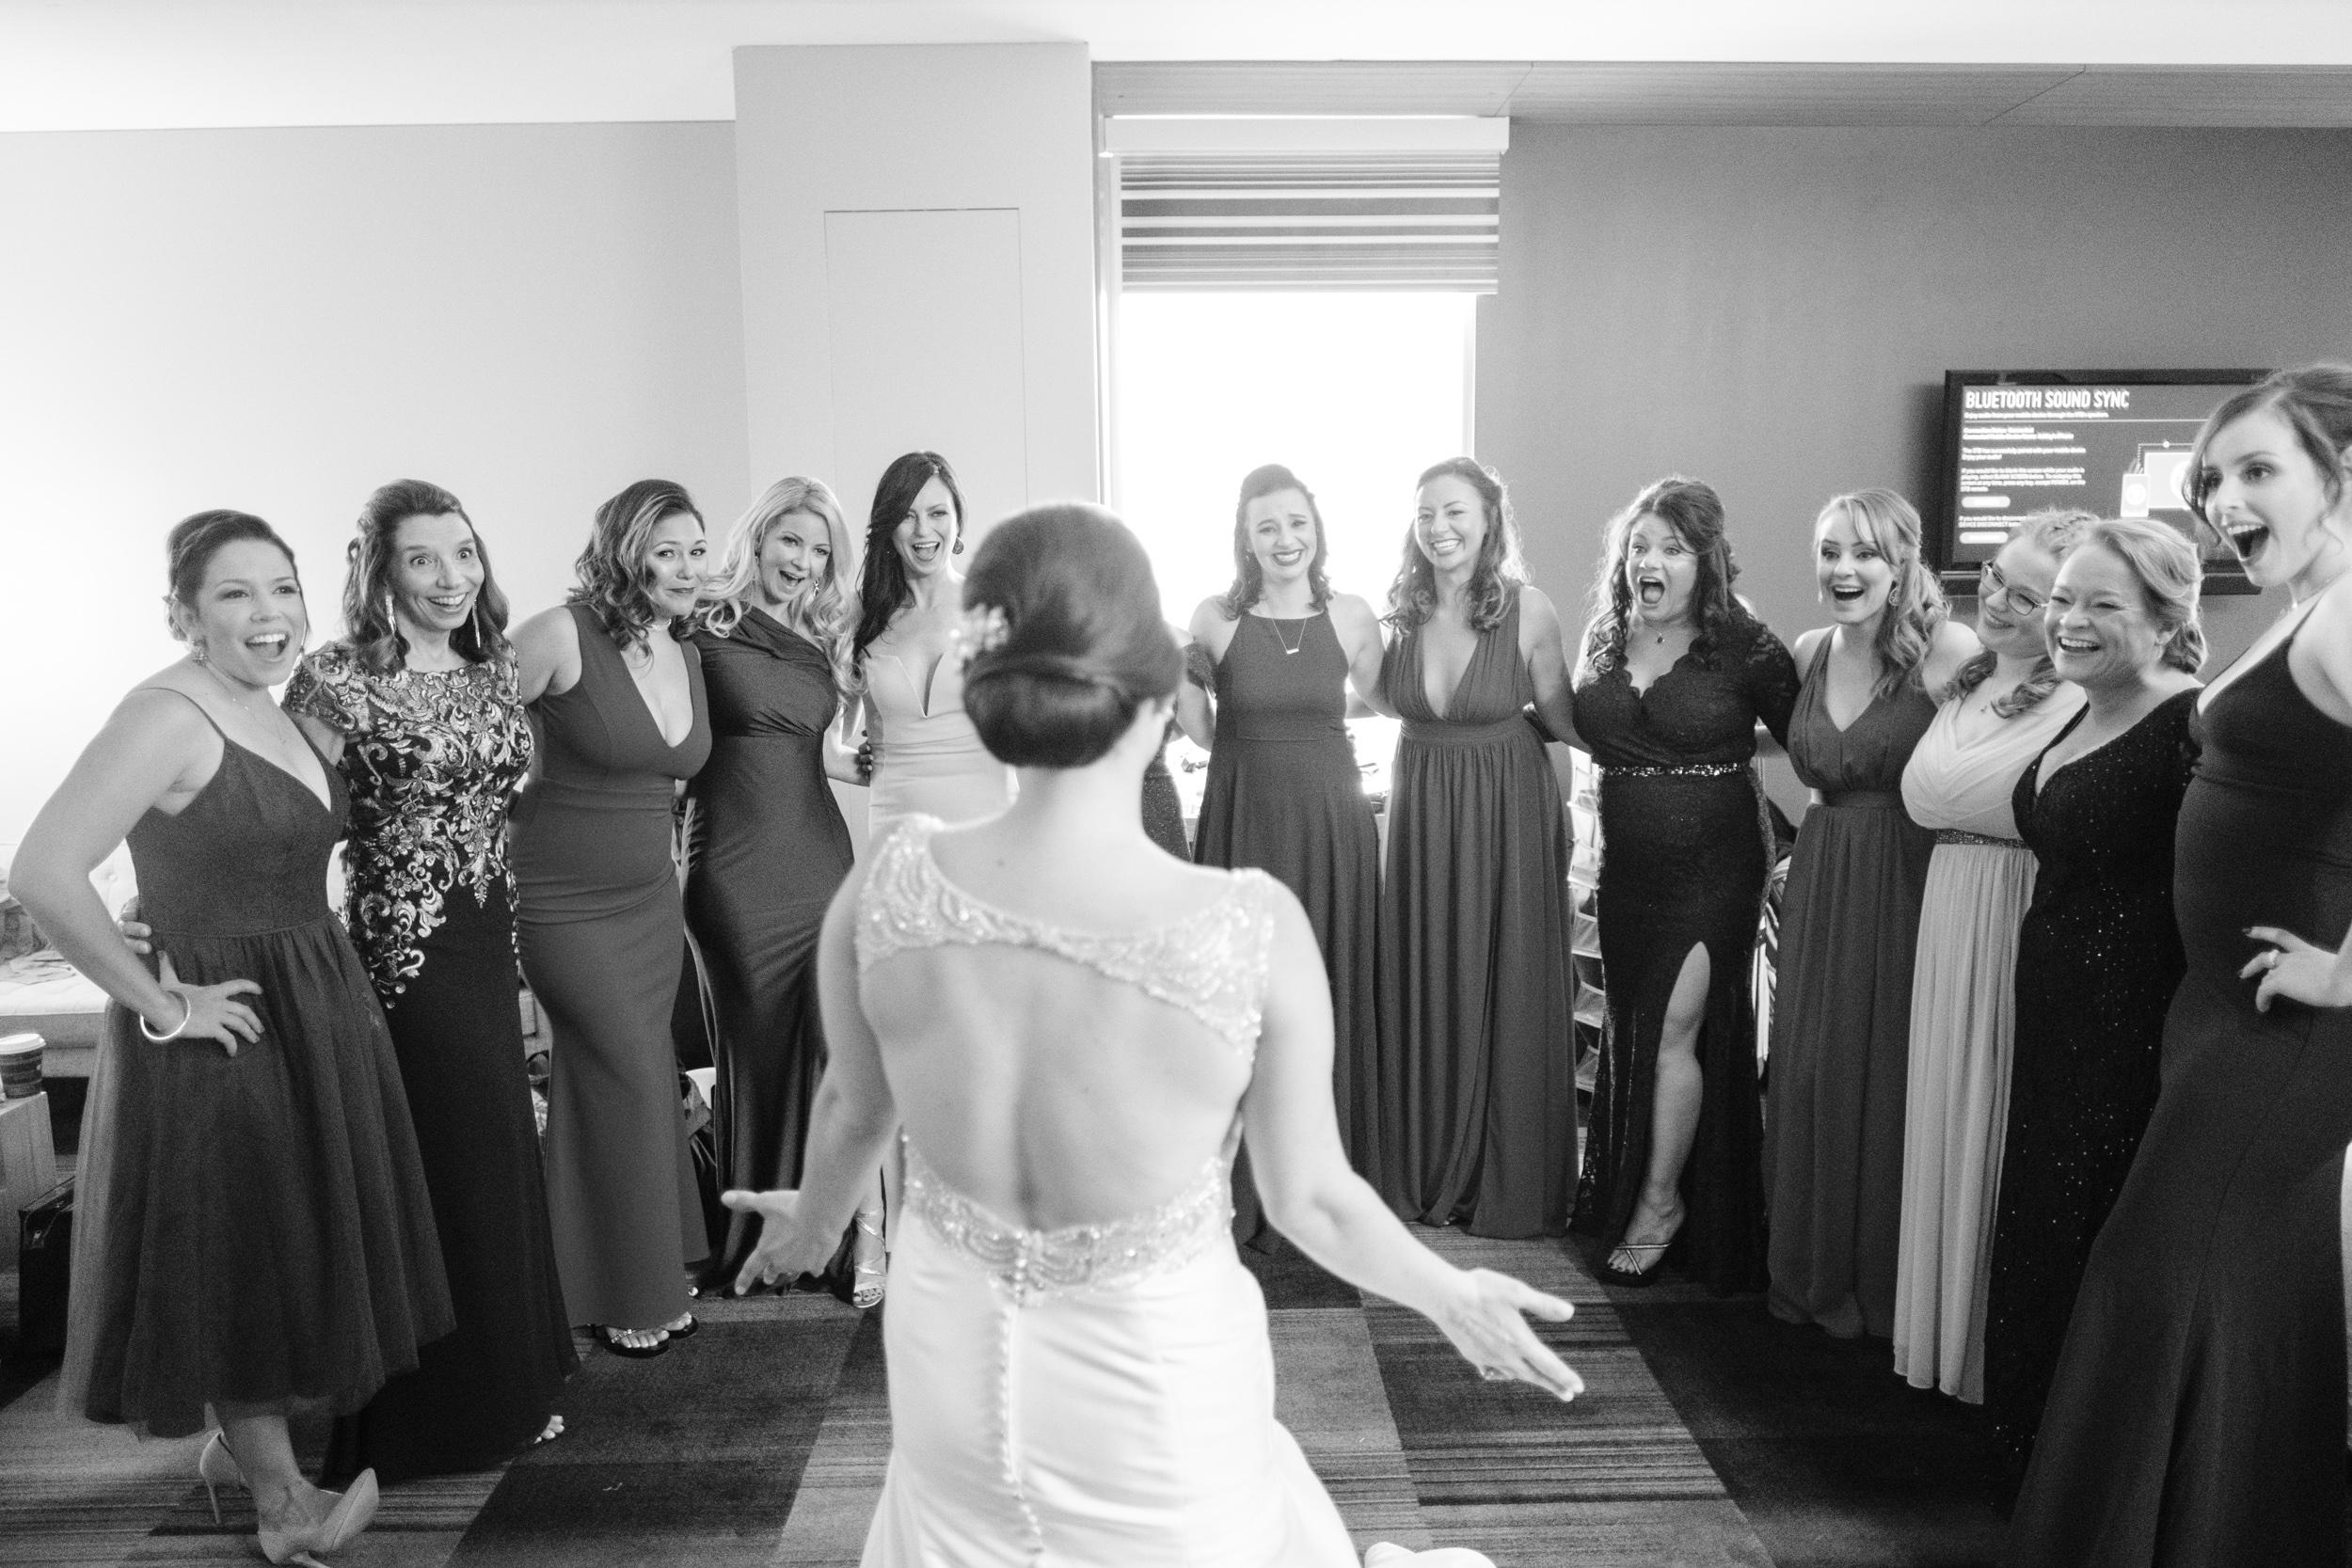 bride joyfully showing off her dress to her best friends on her wedding day